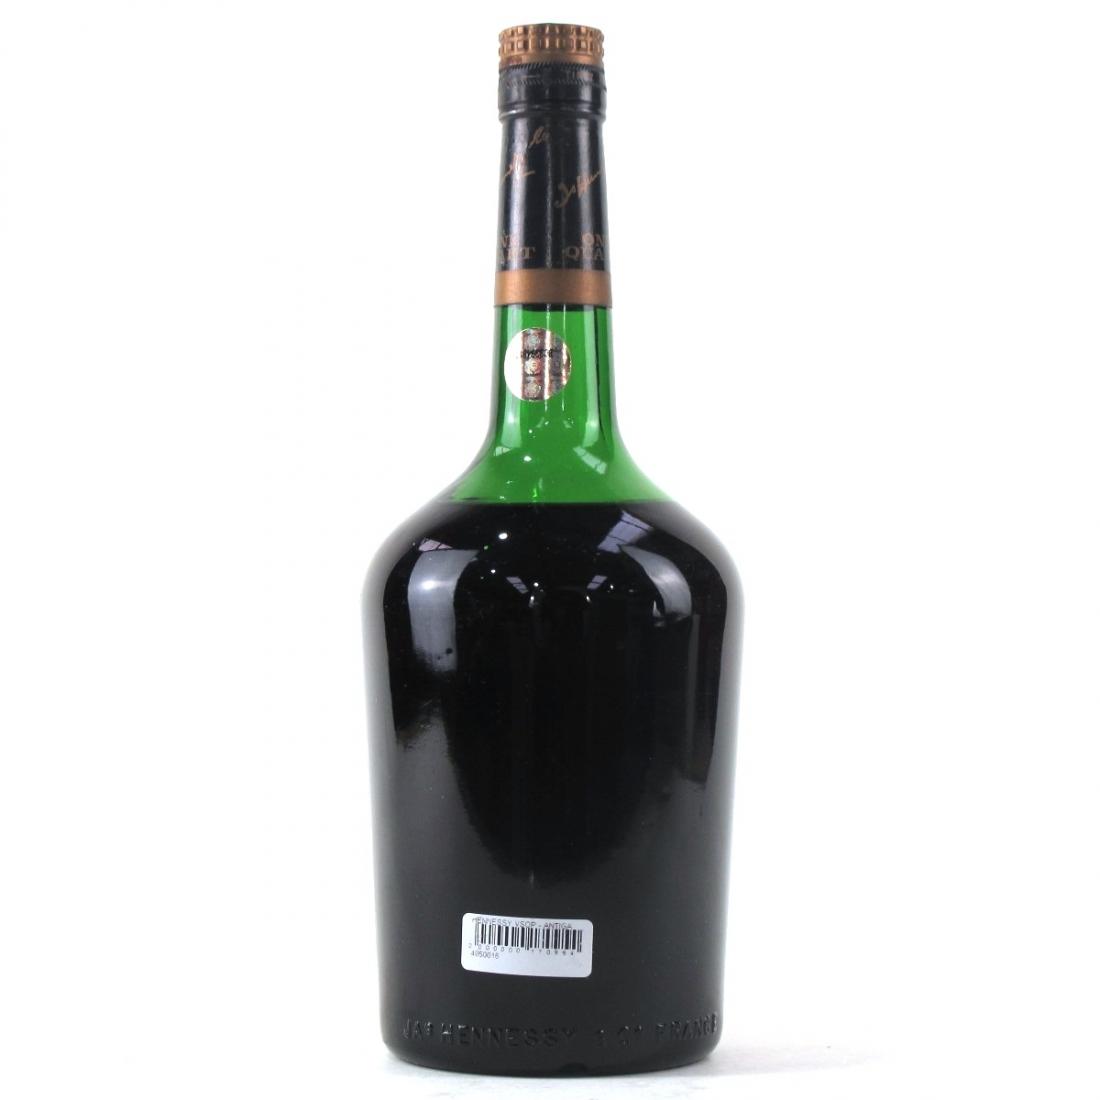 Hennessy VSOP Cognac 1 Quart 1980s